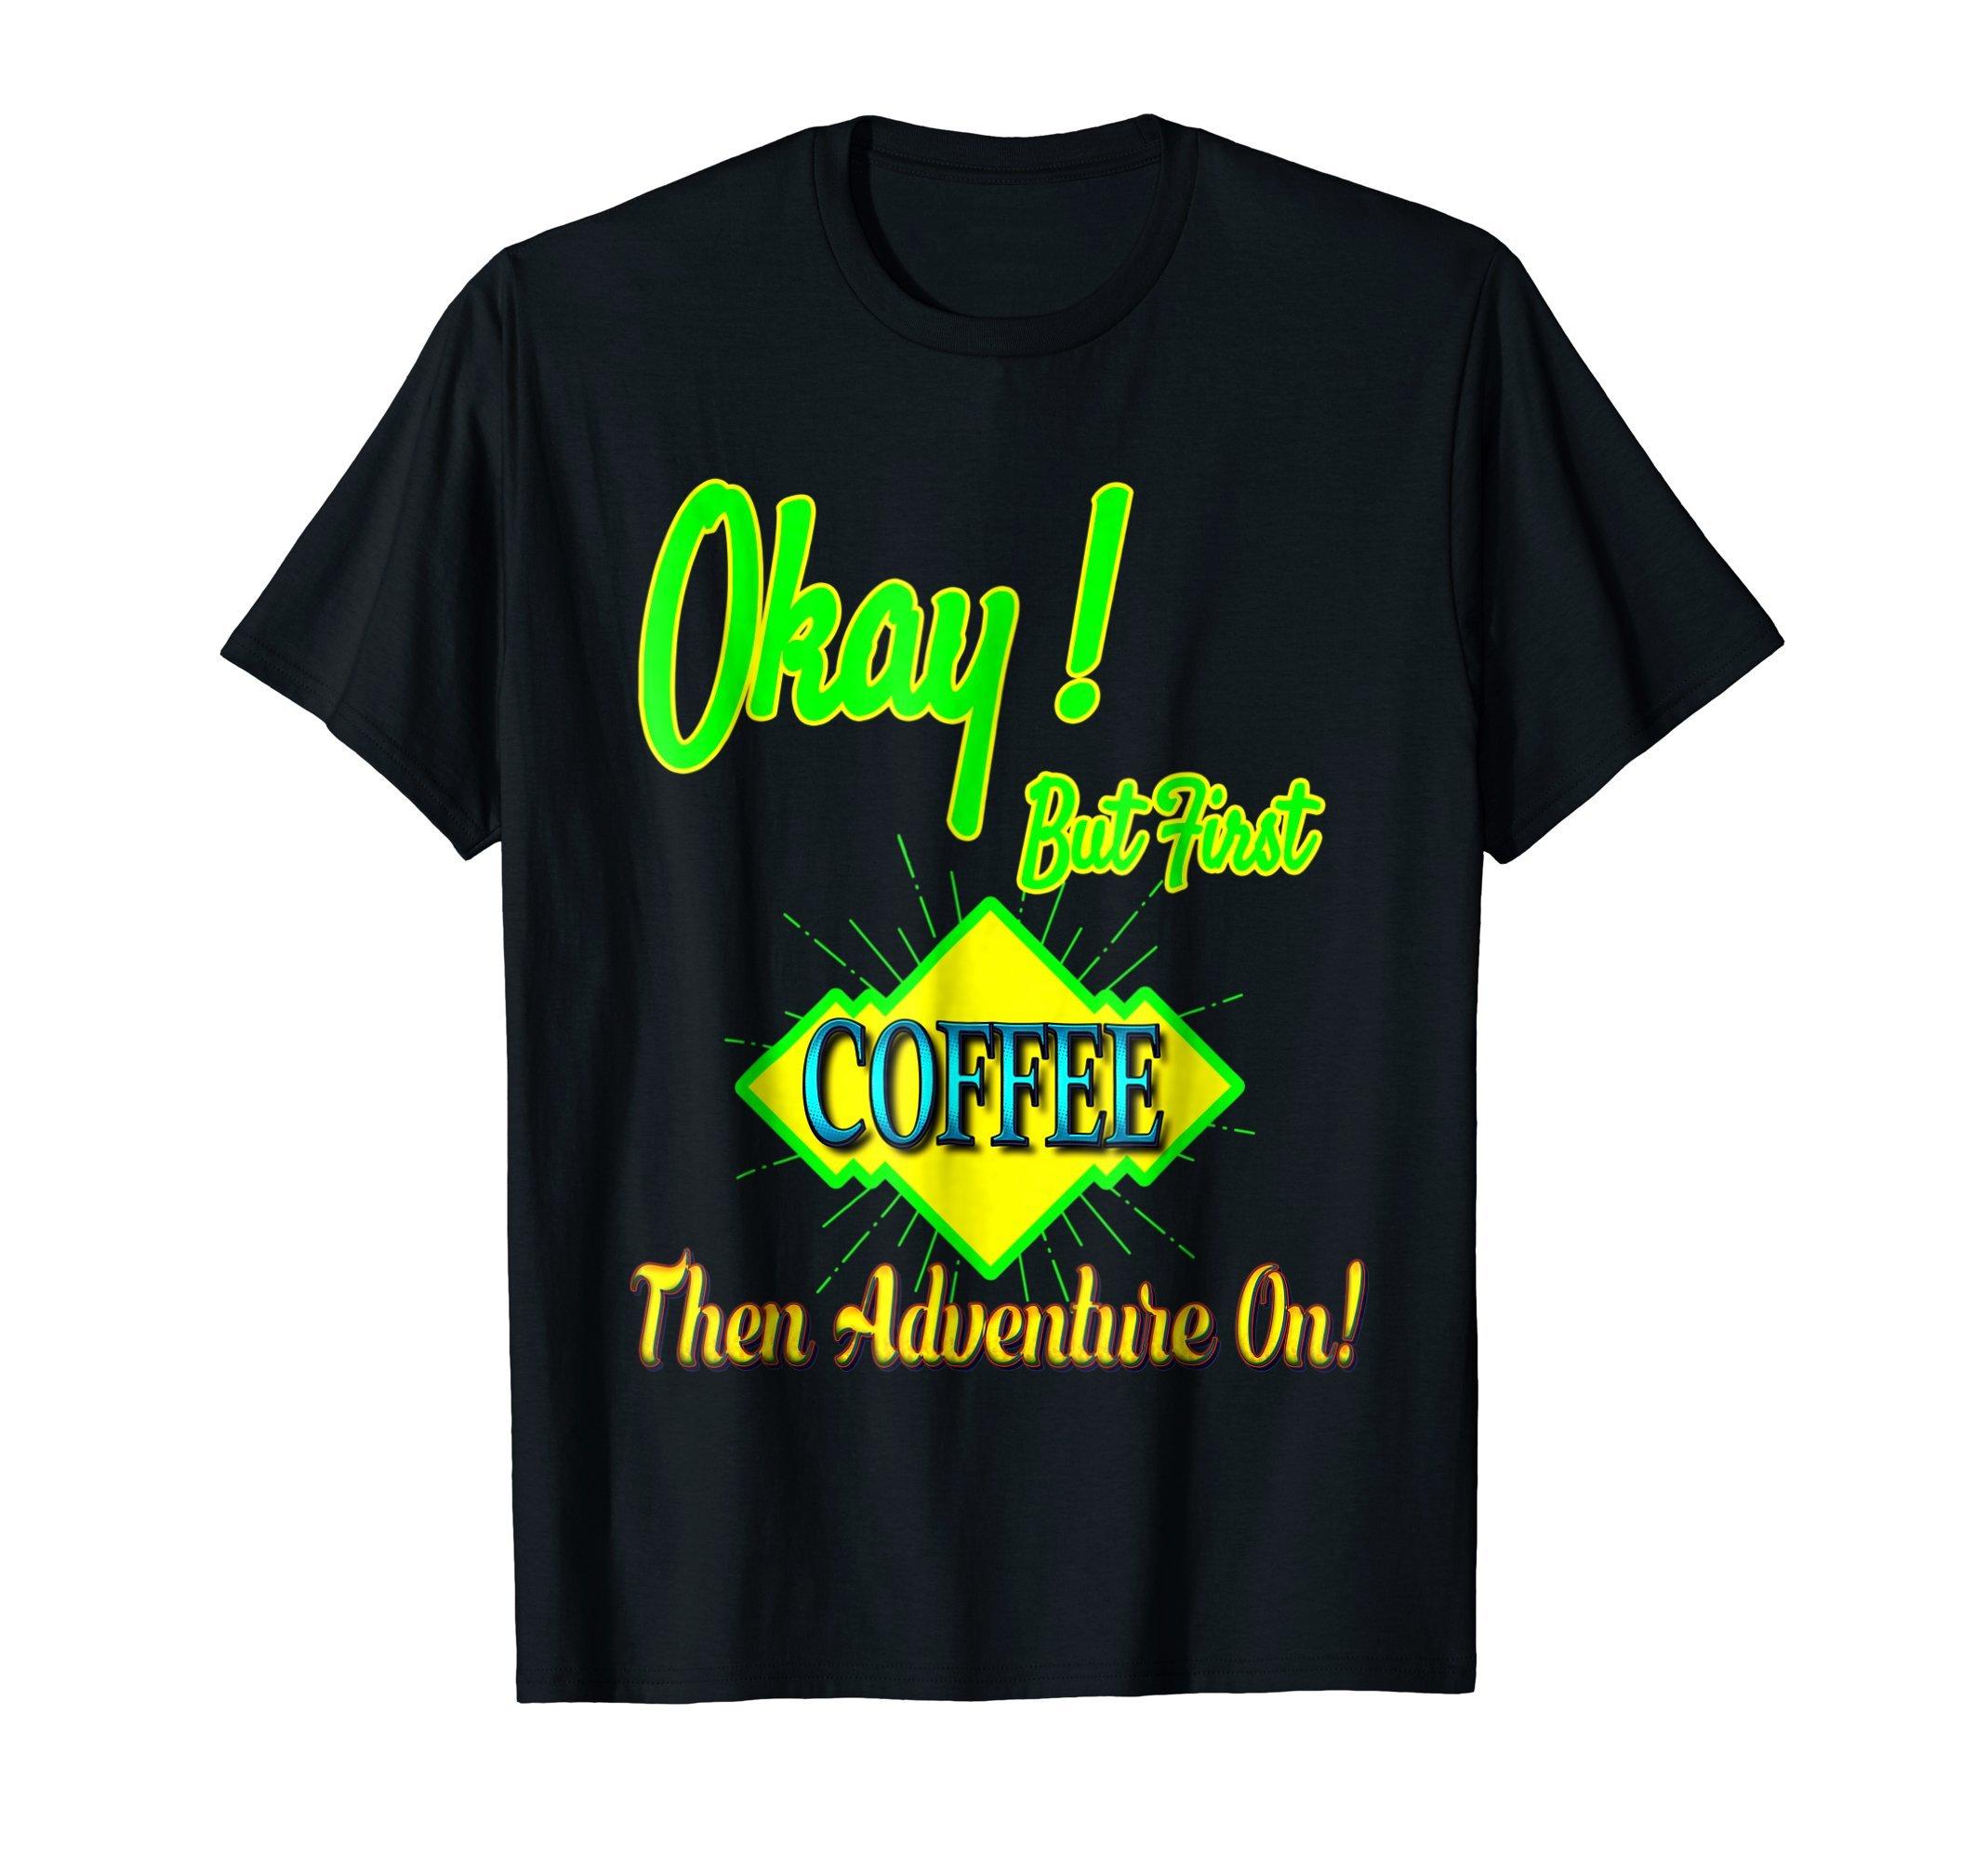 FUNNY VACATION TRAVEL 'COFFEE ADVENTURE' VACAY T-SHIRT